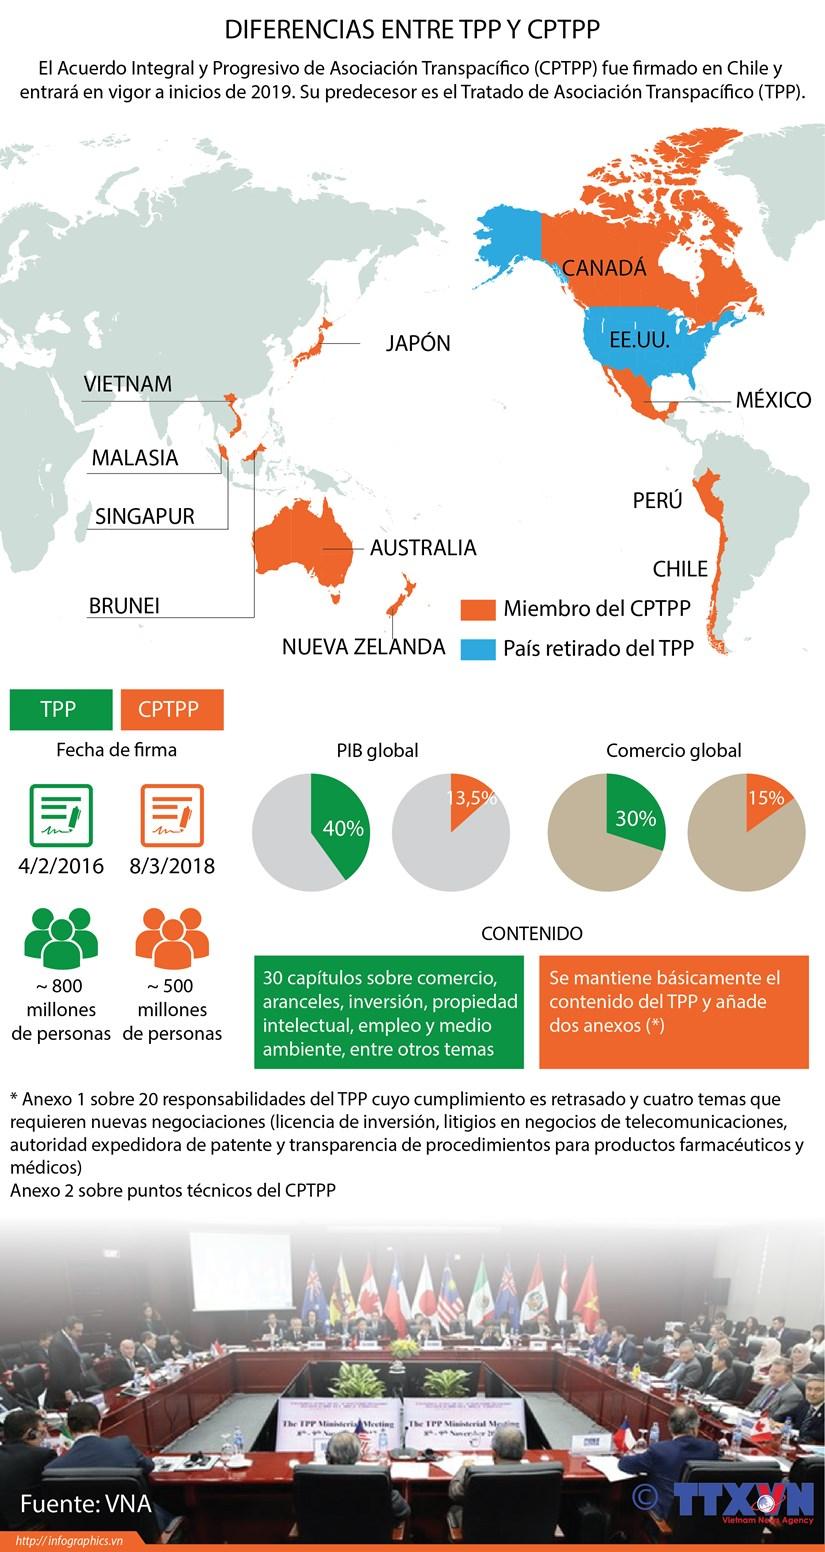 [Infografia] Diferencias entre TPP y CPTPP hinh anh 1